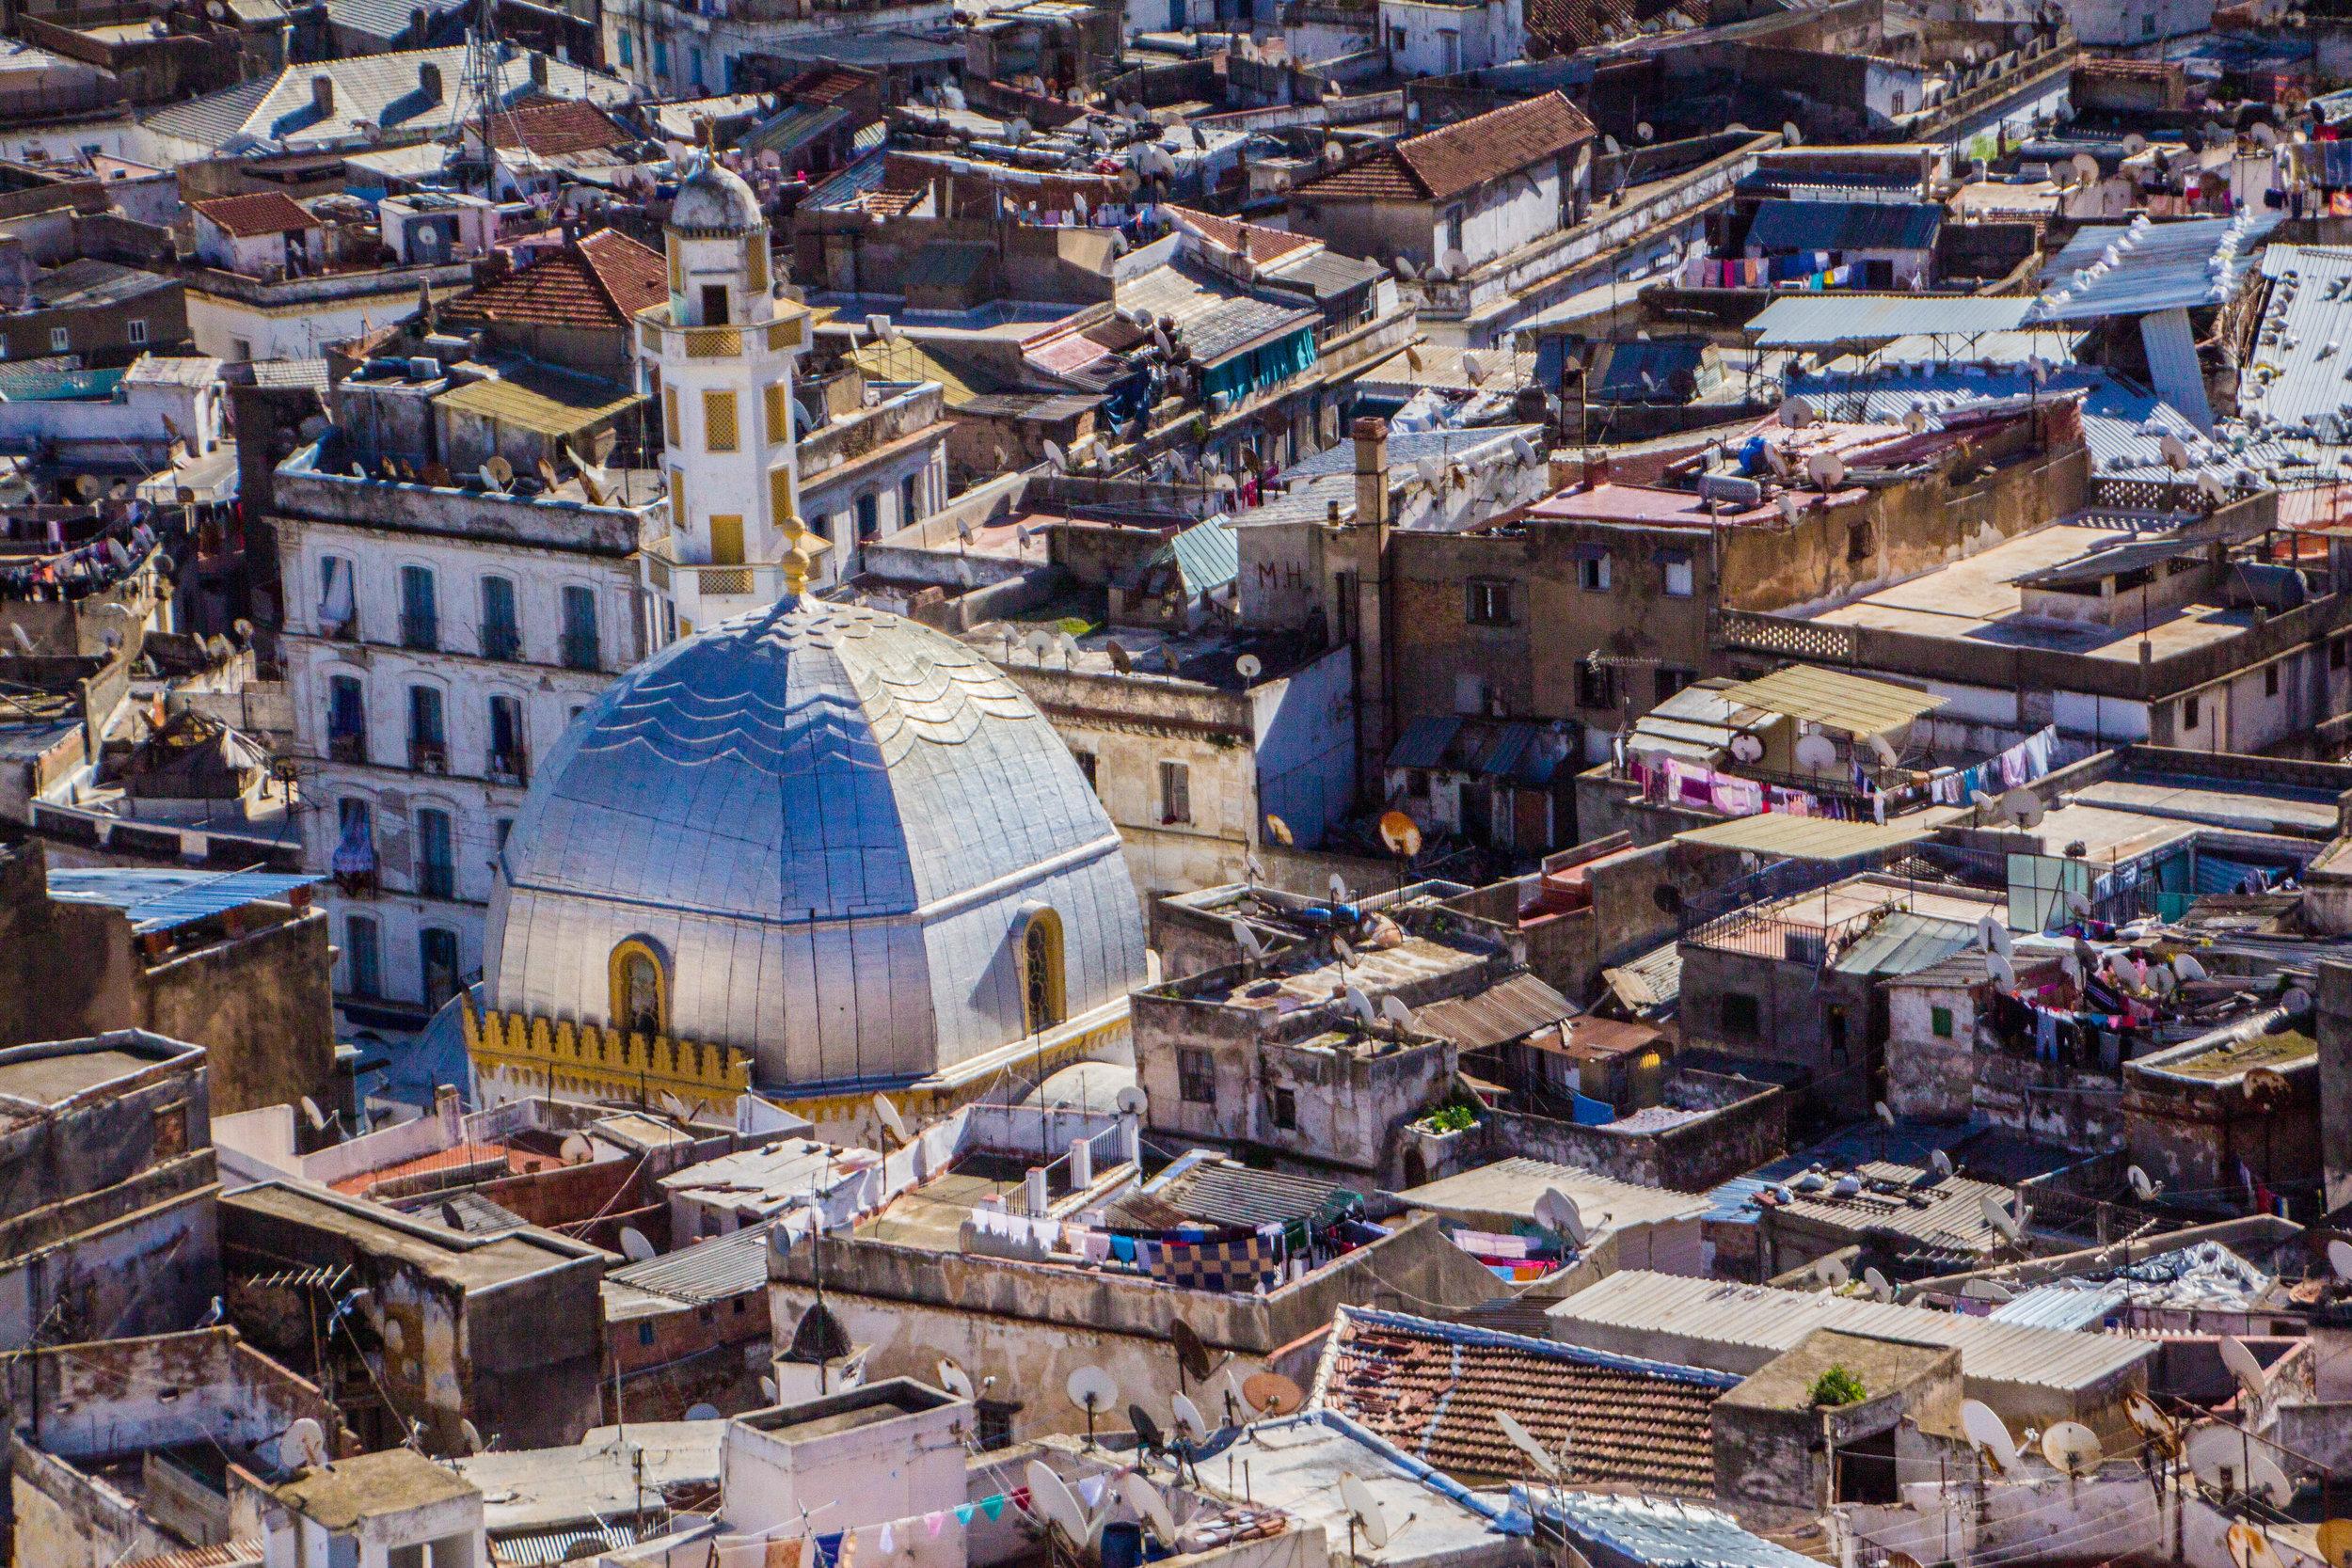 casbah-from-above-algiers-algeria-15.jpg